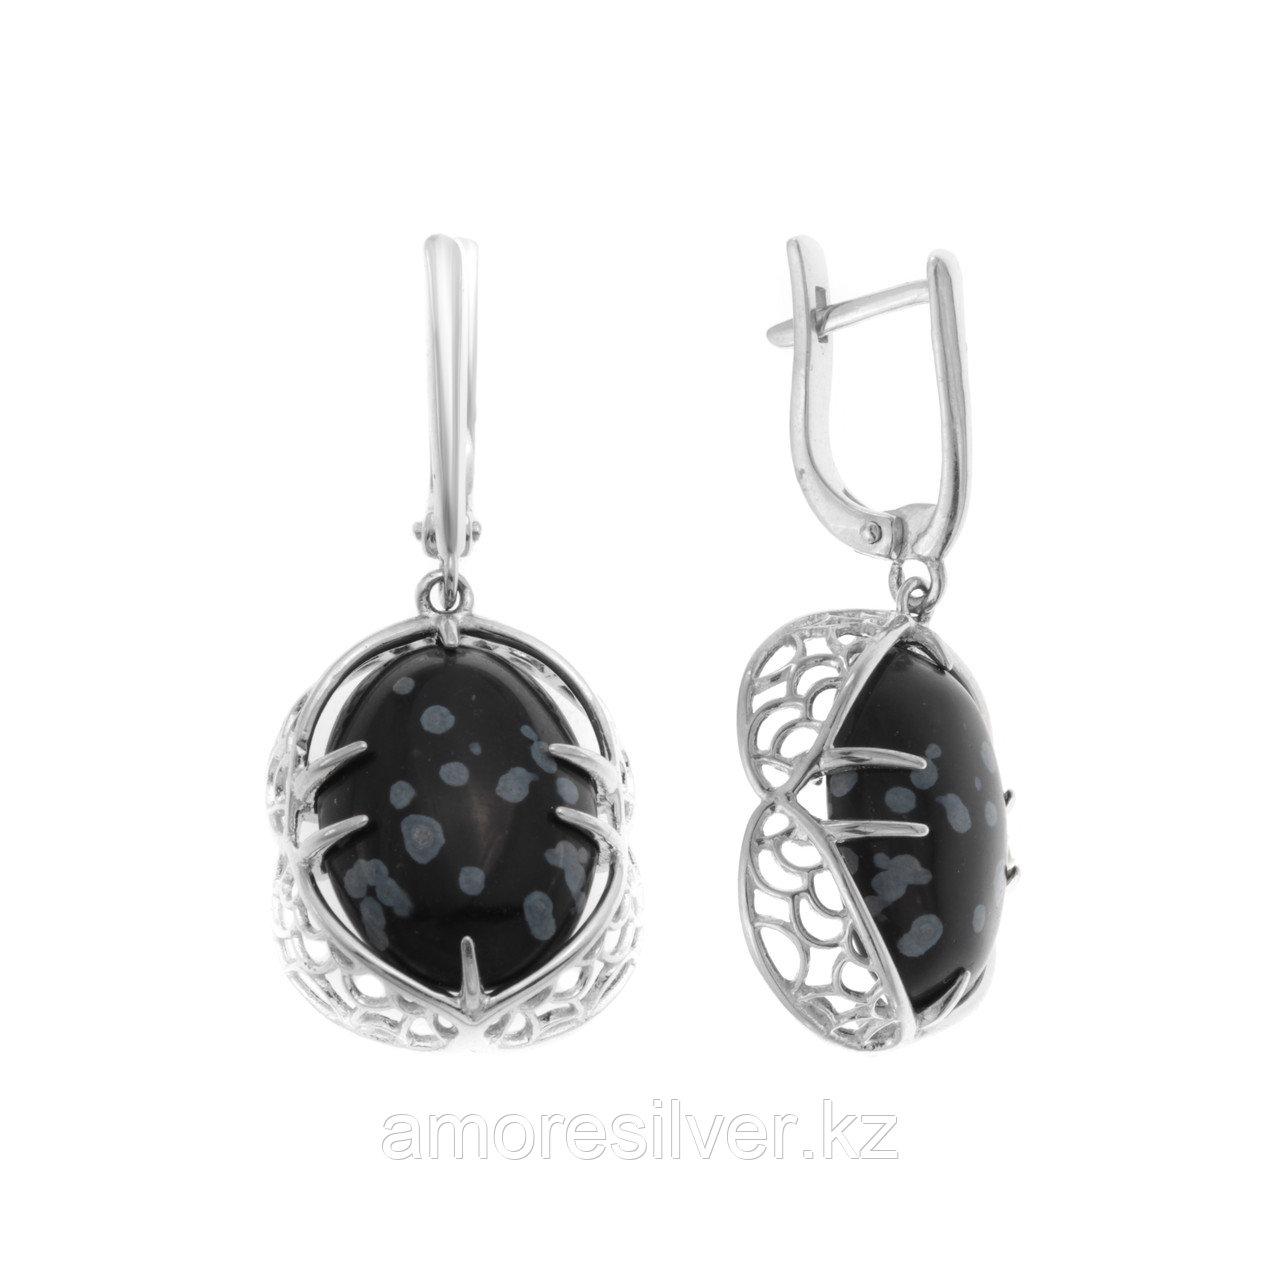 Серьги Алмаз-Групп серебро с родием, авантюрин жадеит обсидиан сердолик 12030034